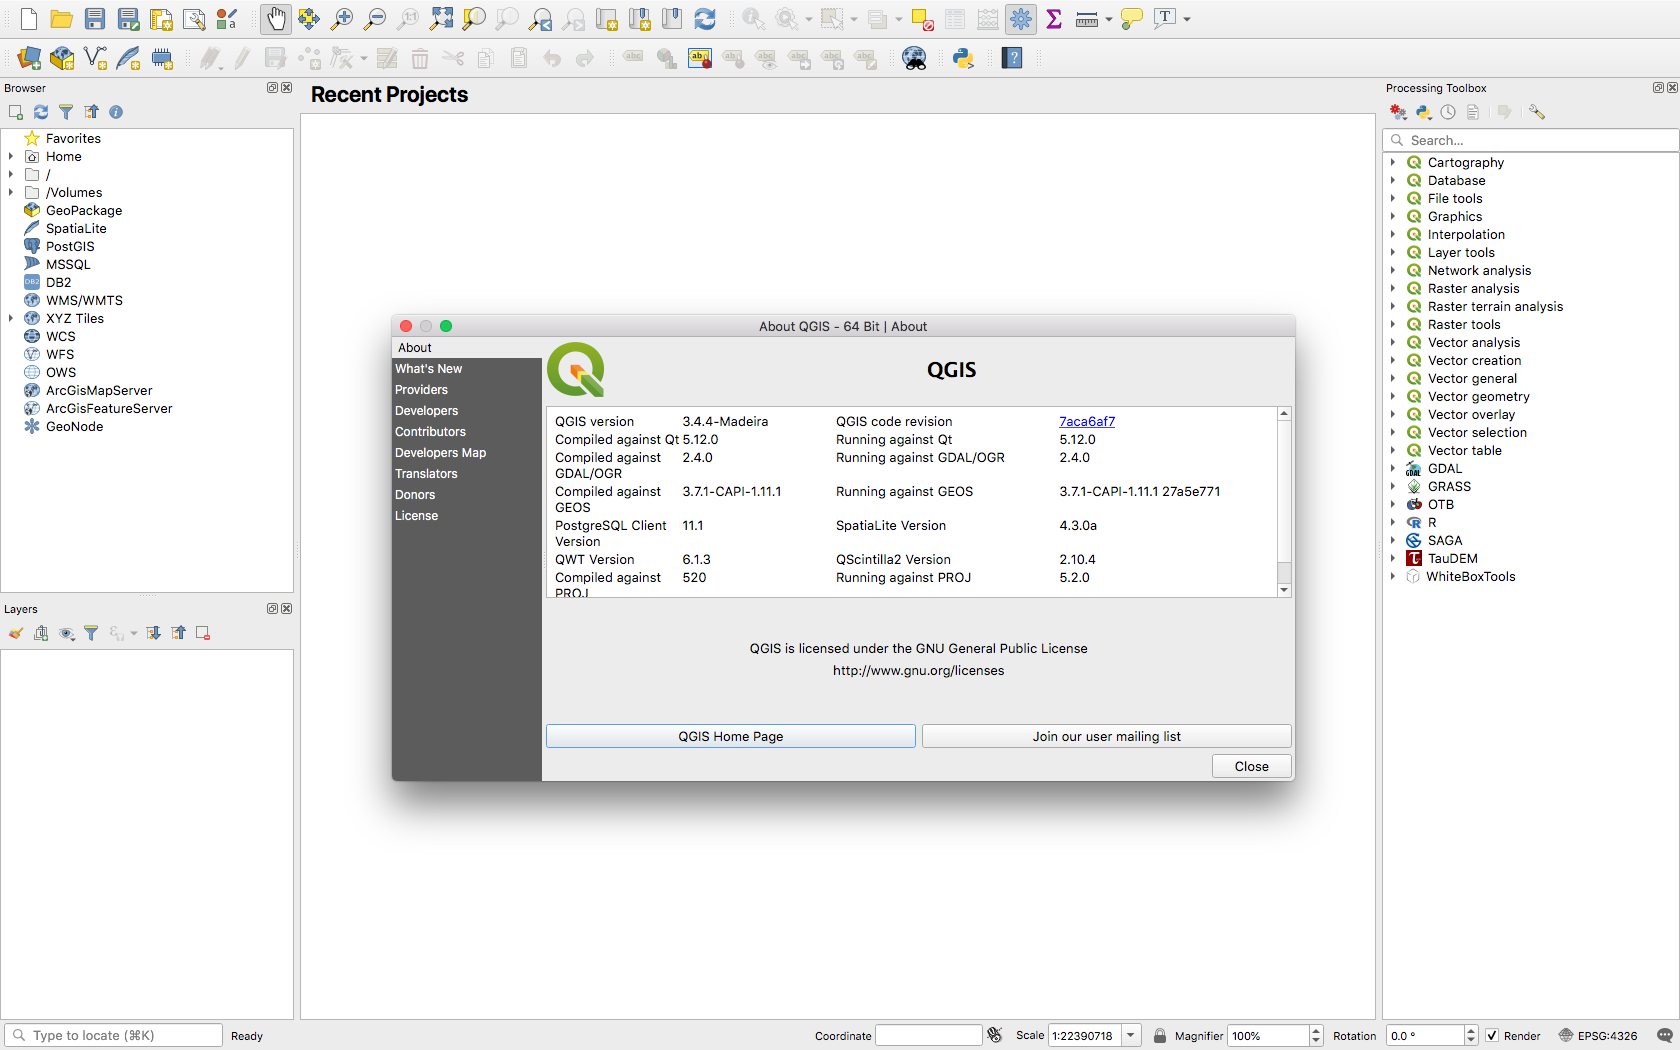 New QGIS formula with LASTools, Whitebox, TauDEM, Six and